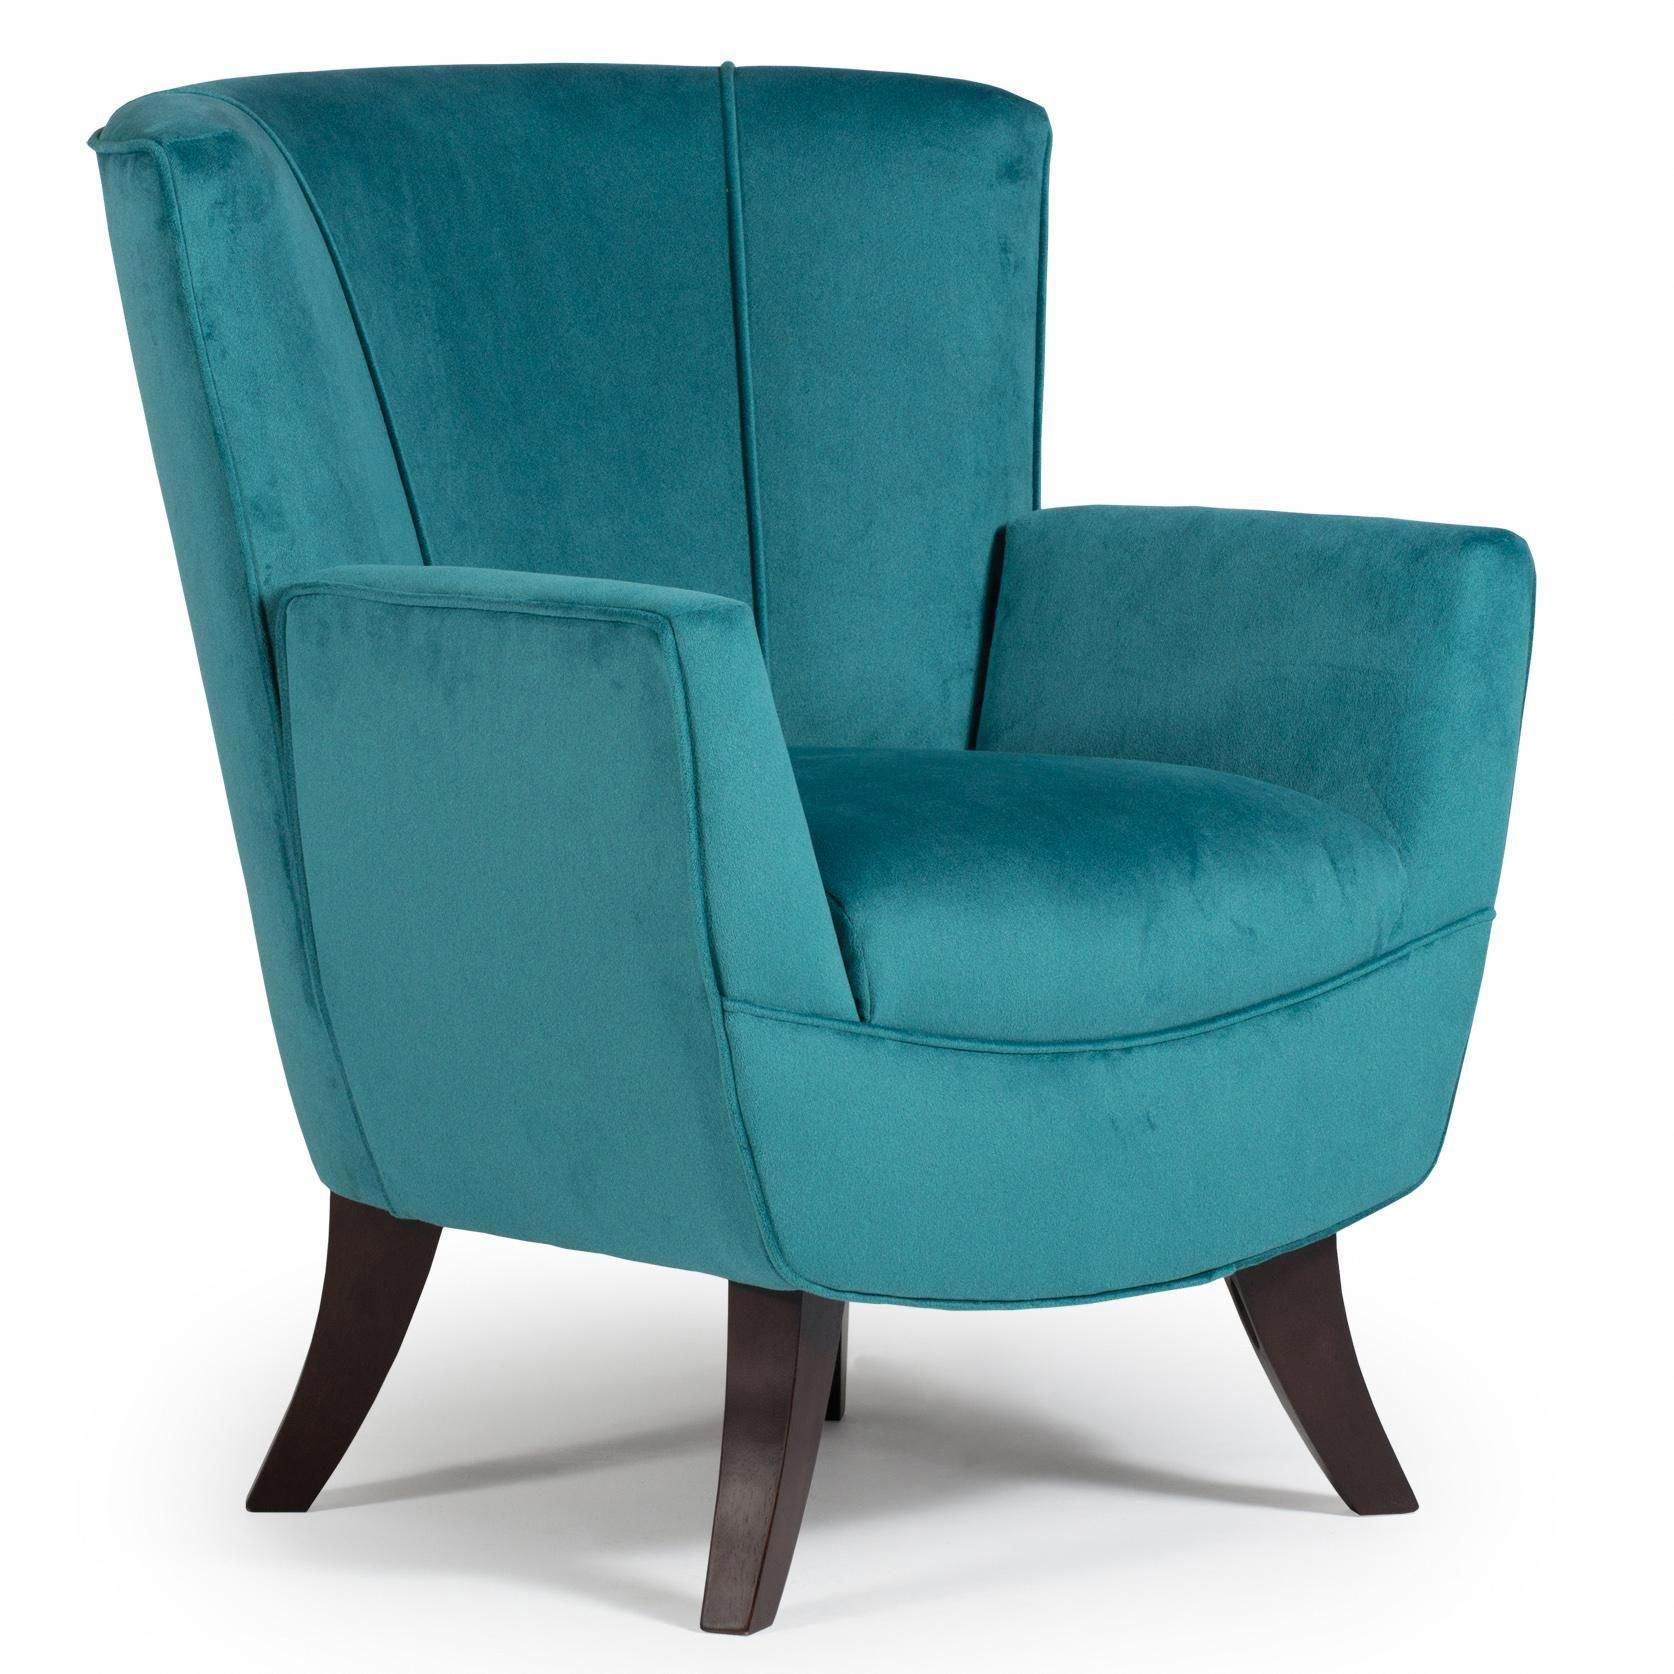 Homefurnishings Goods Home Furnishings Club Chairs Home